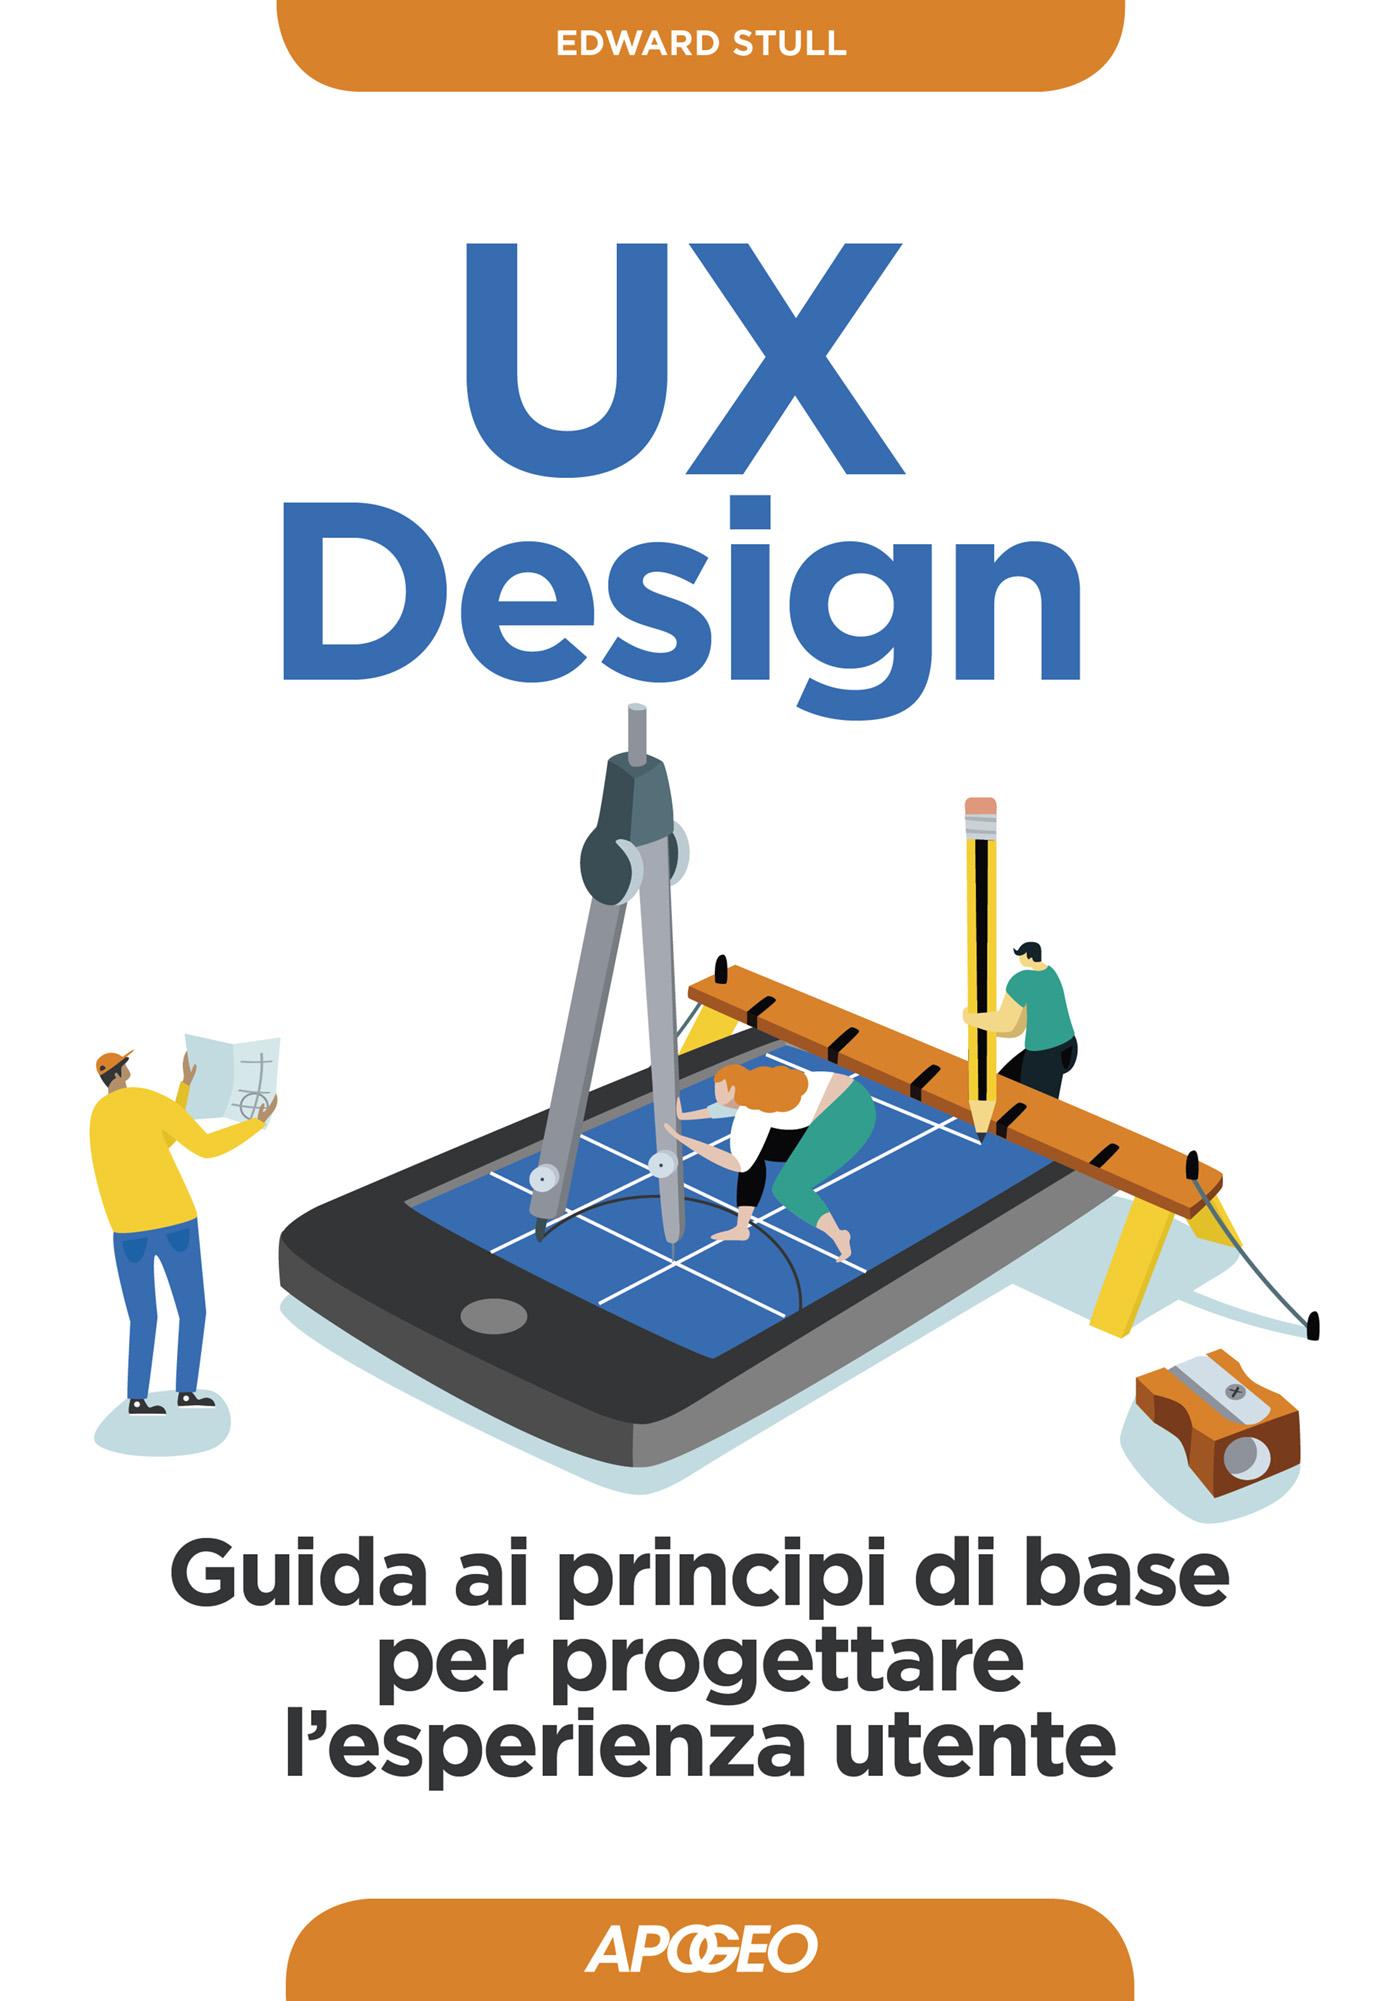 UX Design, di Edward Stull